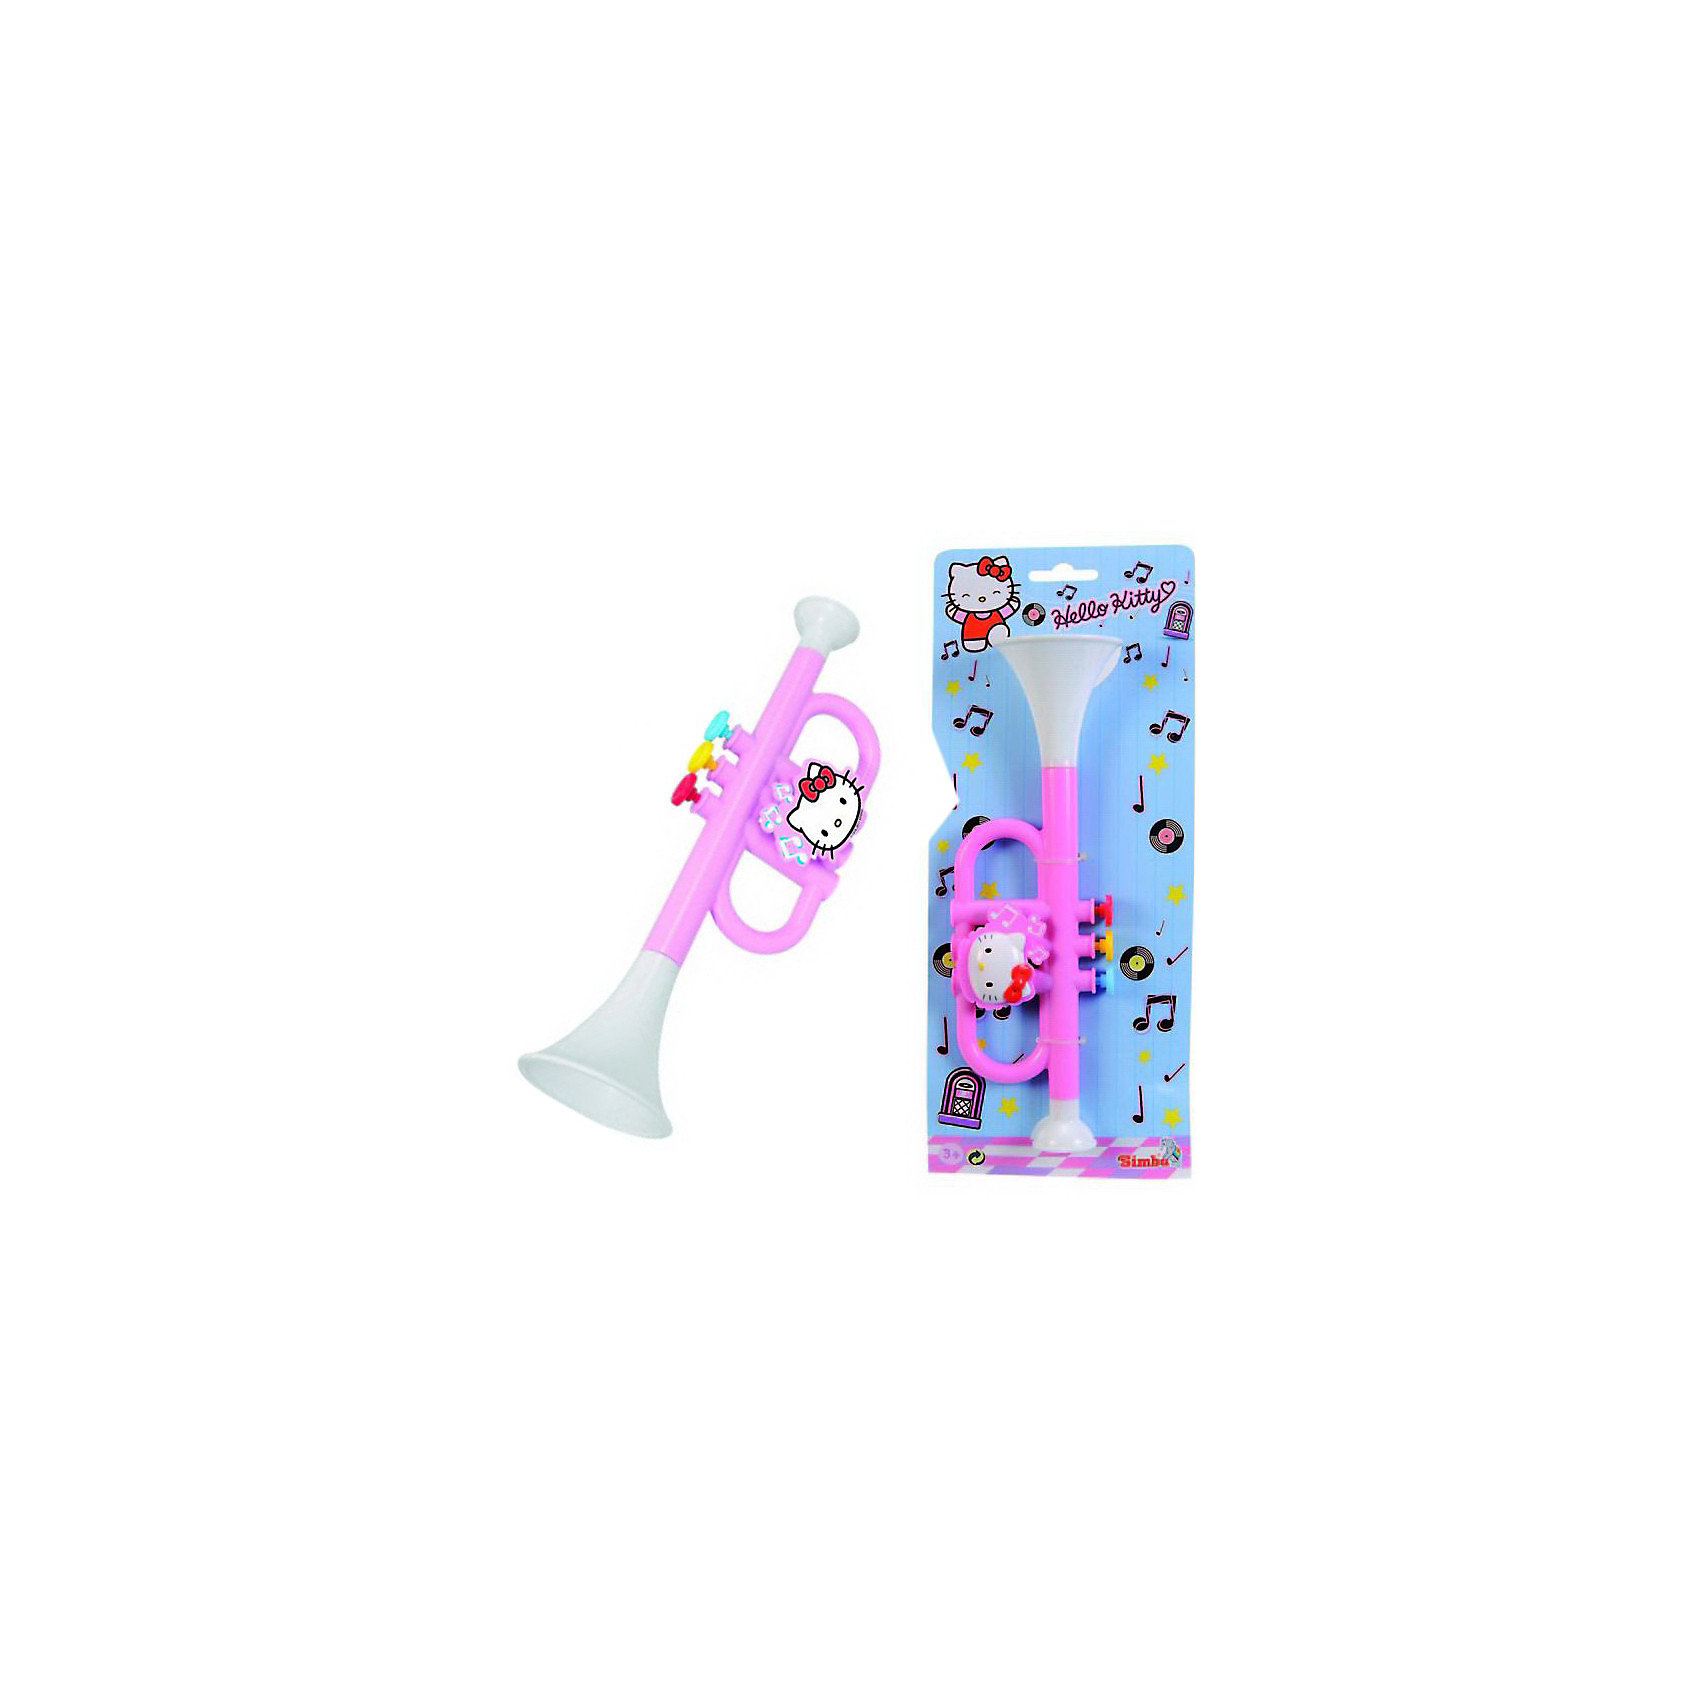 Simba Simba                 Труба Hello Kitty игрушки для кукольных домиков re ment re ment rement hello kitty supermarket